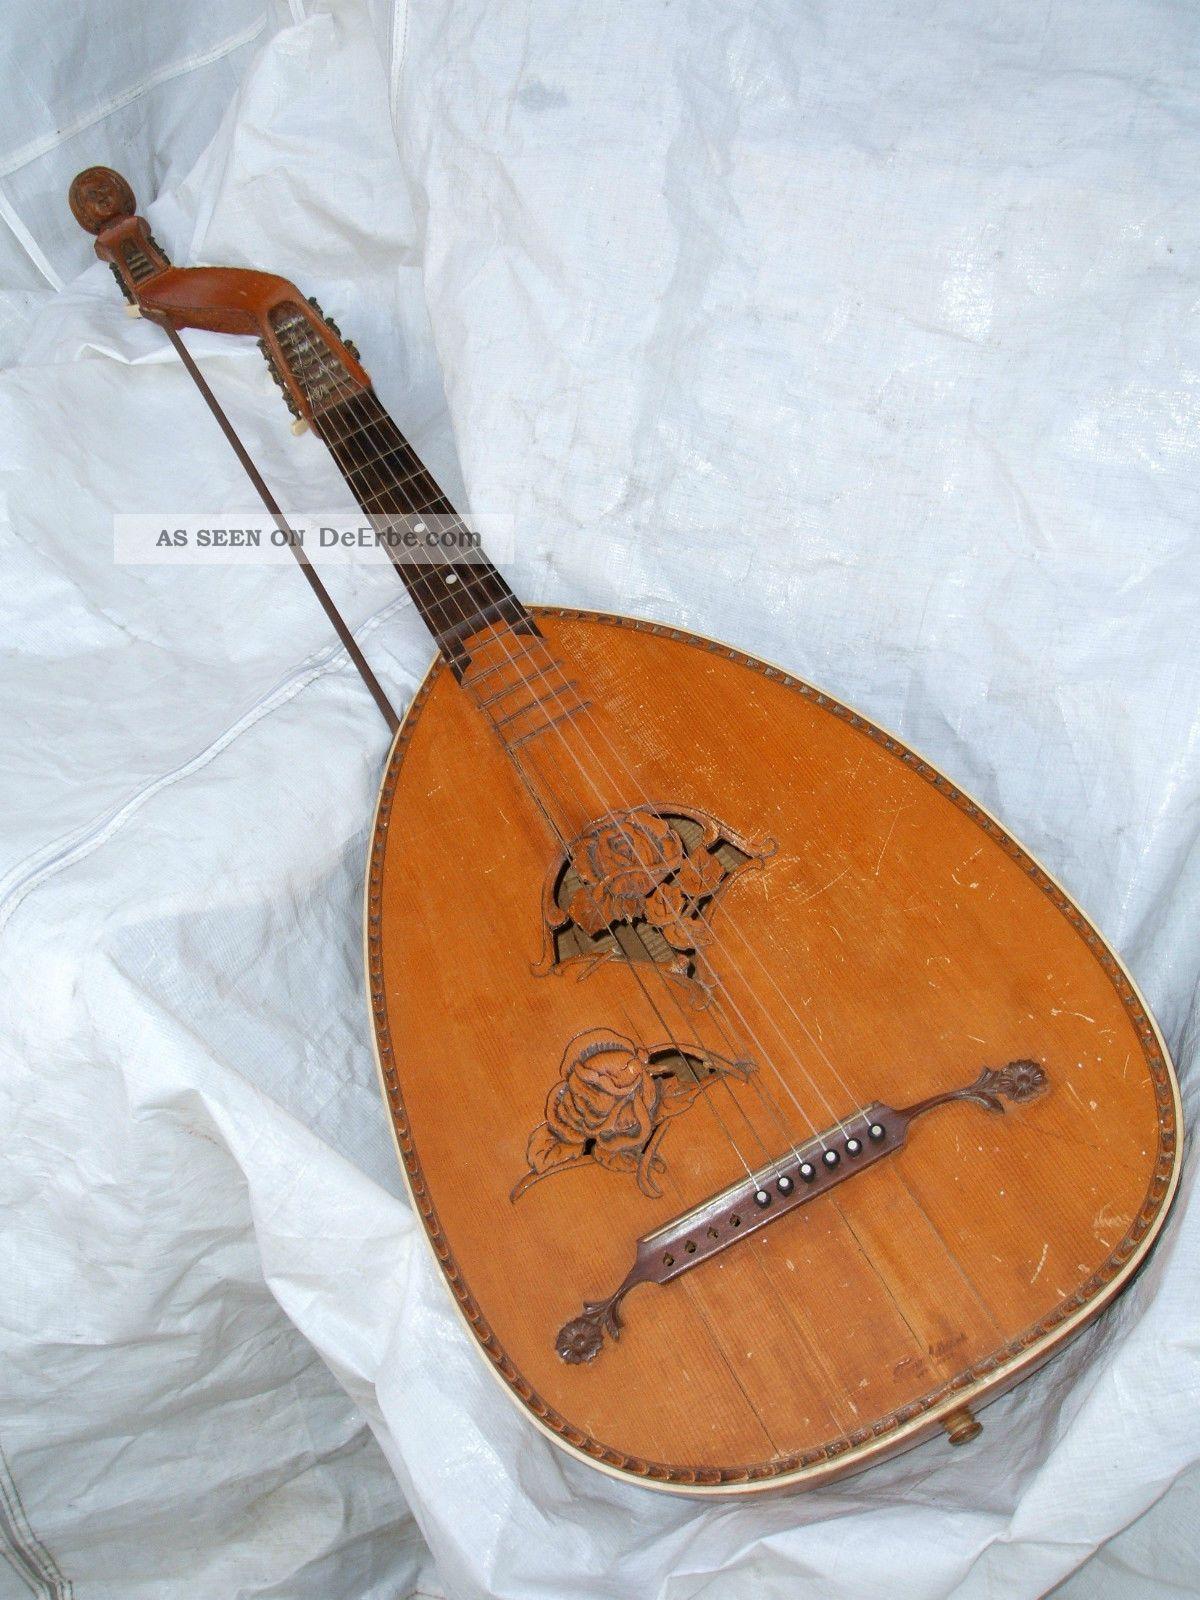 Antique German Lute Bass Gitarrenlaute Lauto Guitarra Antigua Luth Theorbe Basso Musikinstrumente Bild